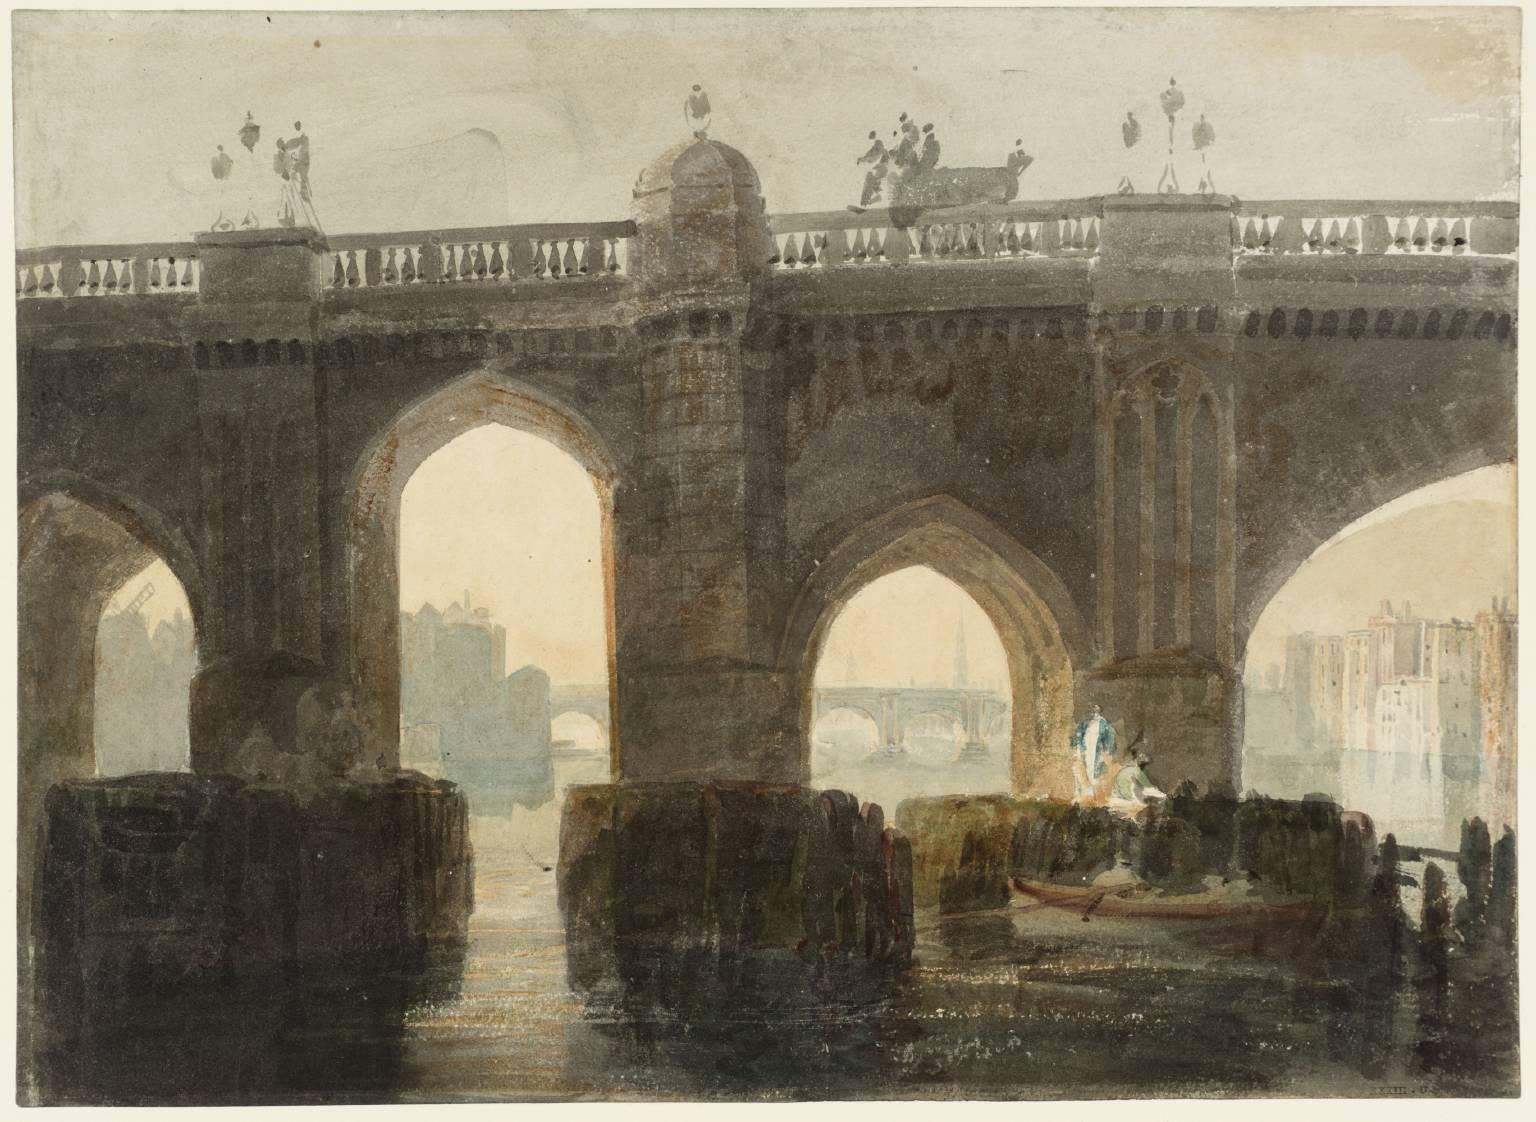 'Old London Bridge' by Joseph Mallord William Turner